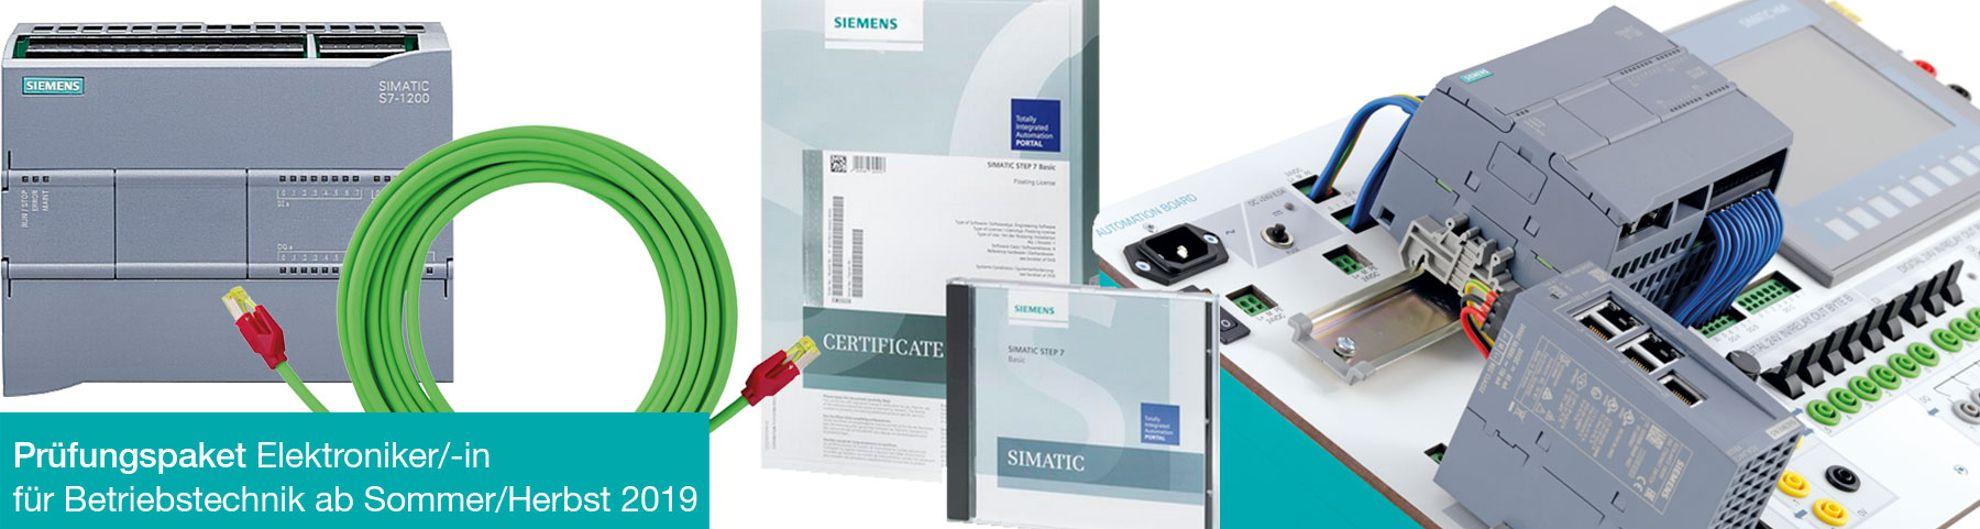 S7-1215C Prüfungspaket EBT